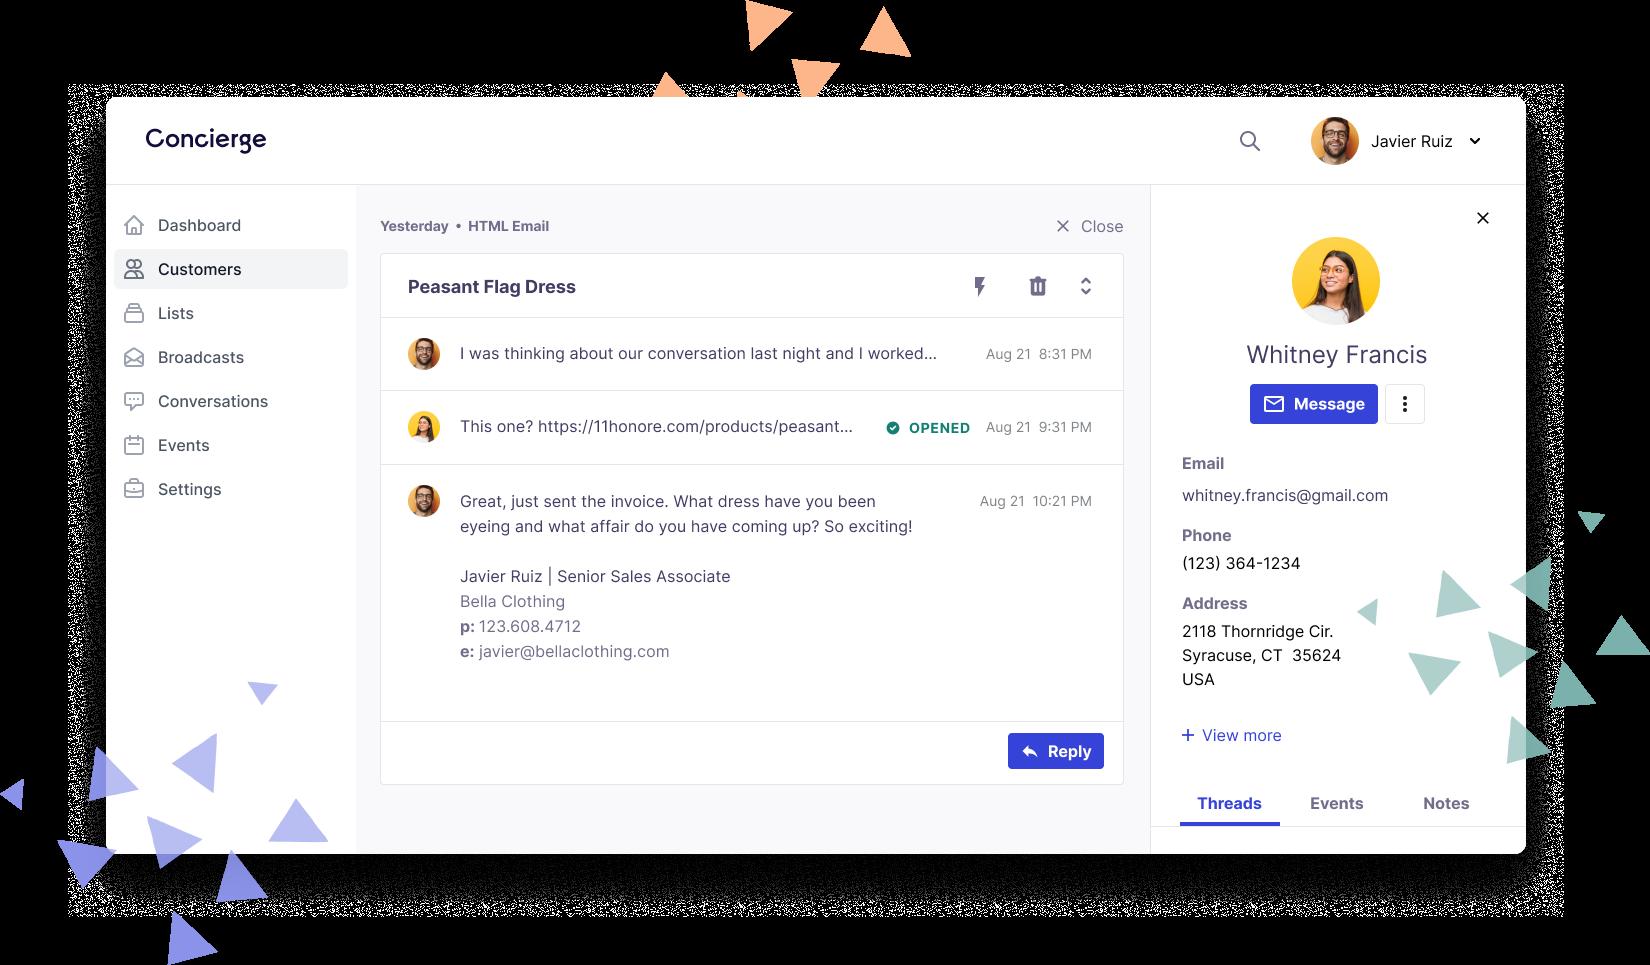 Concierge messaging UI